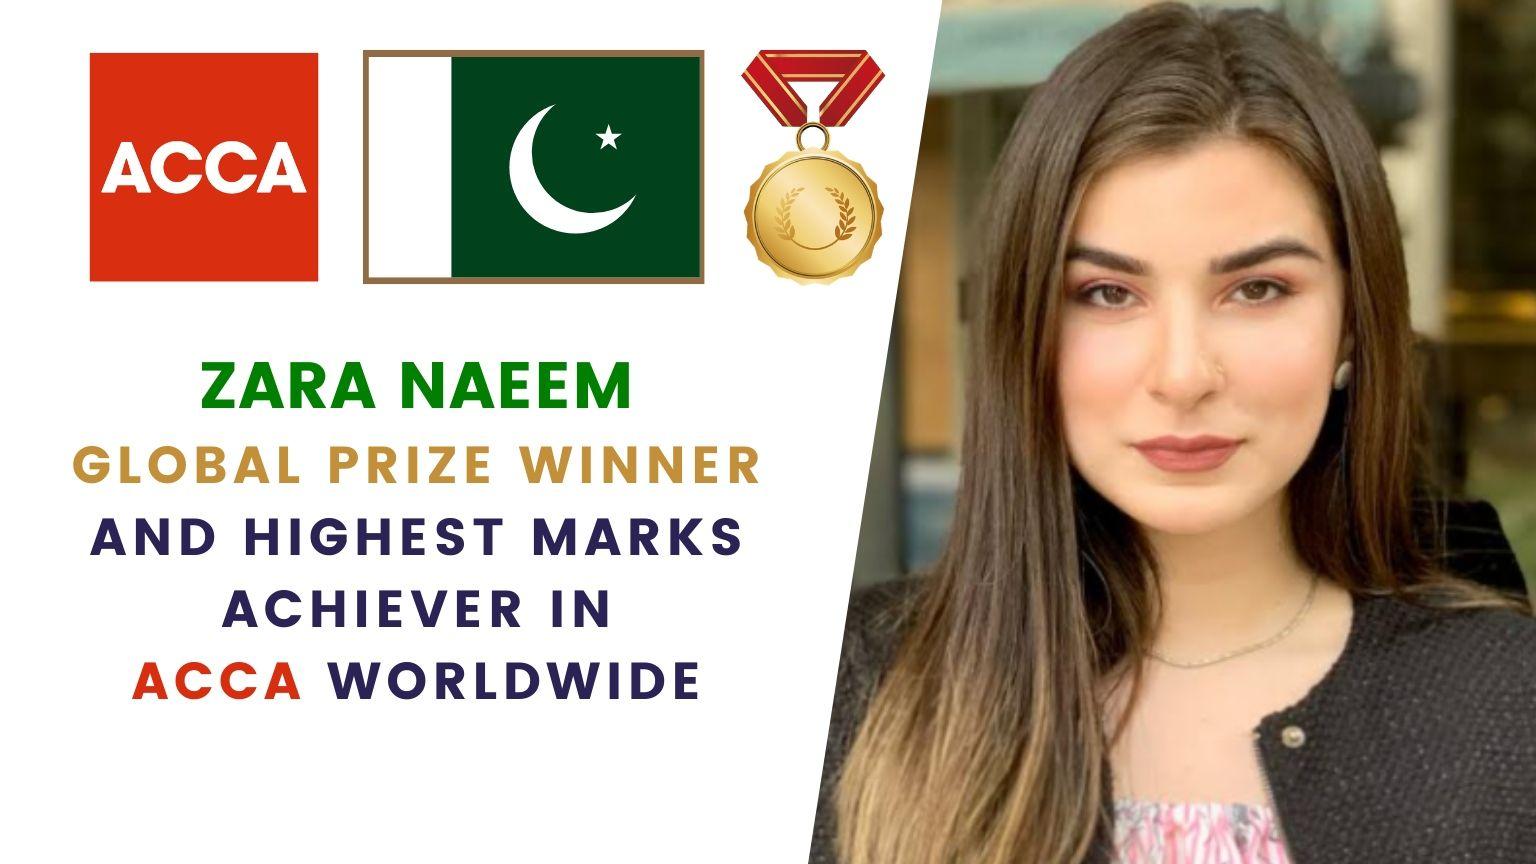 Zara Naeem Dar | 🇵🇰 Pakistani | ACCA Global Prize Winner 🥇